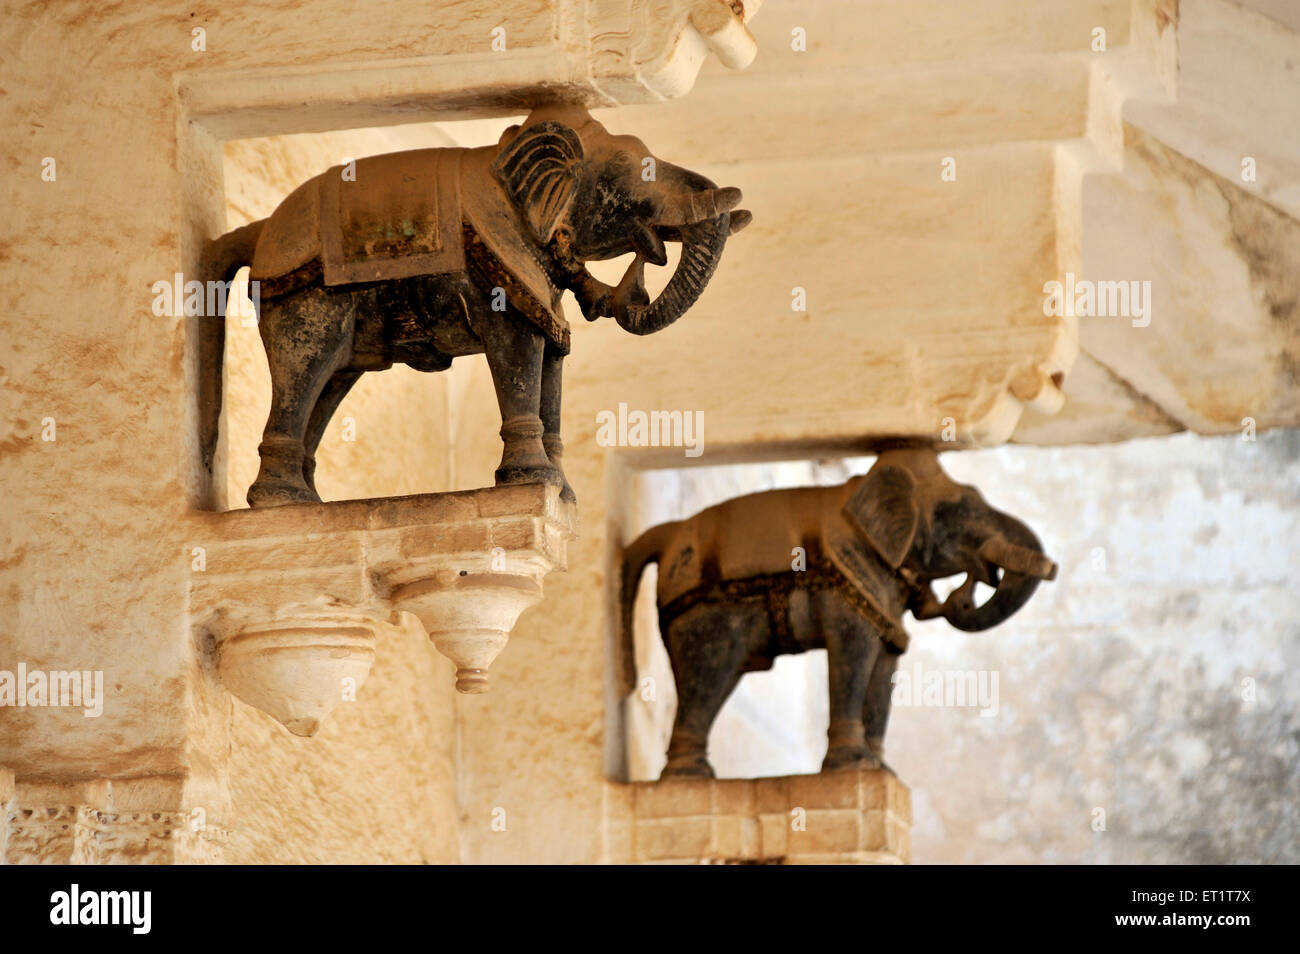 Elephant Statue Stock Photos Amp Elephant Statue Stock